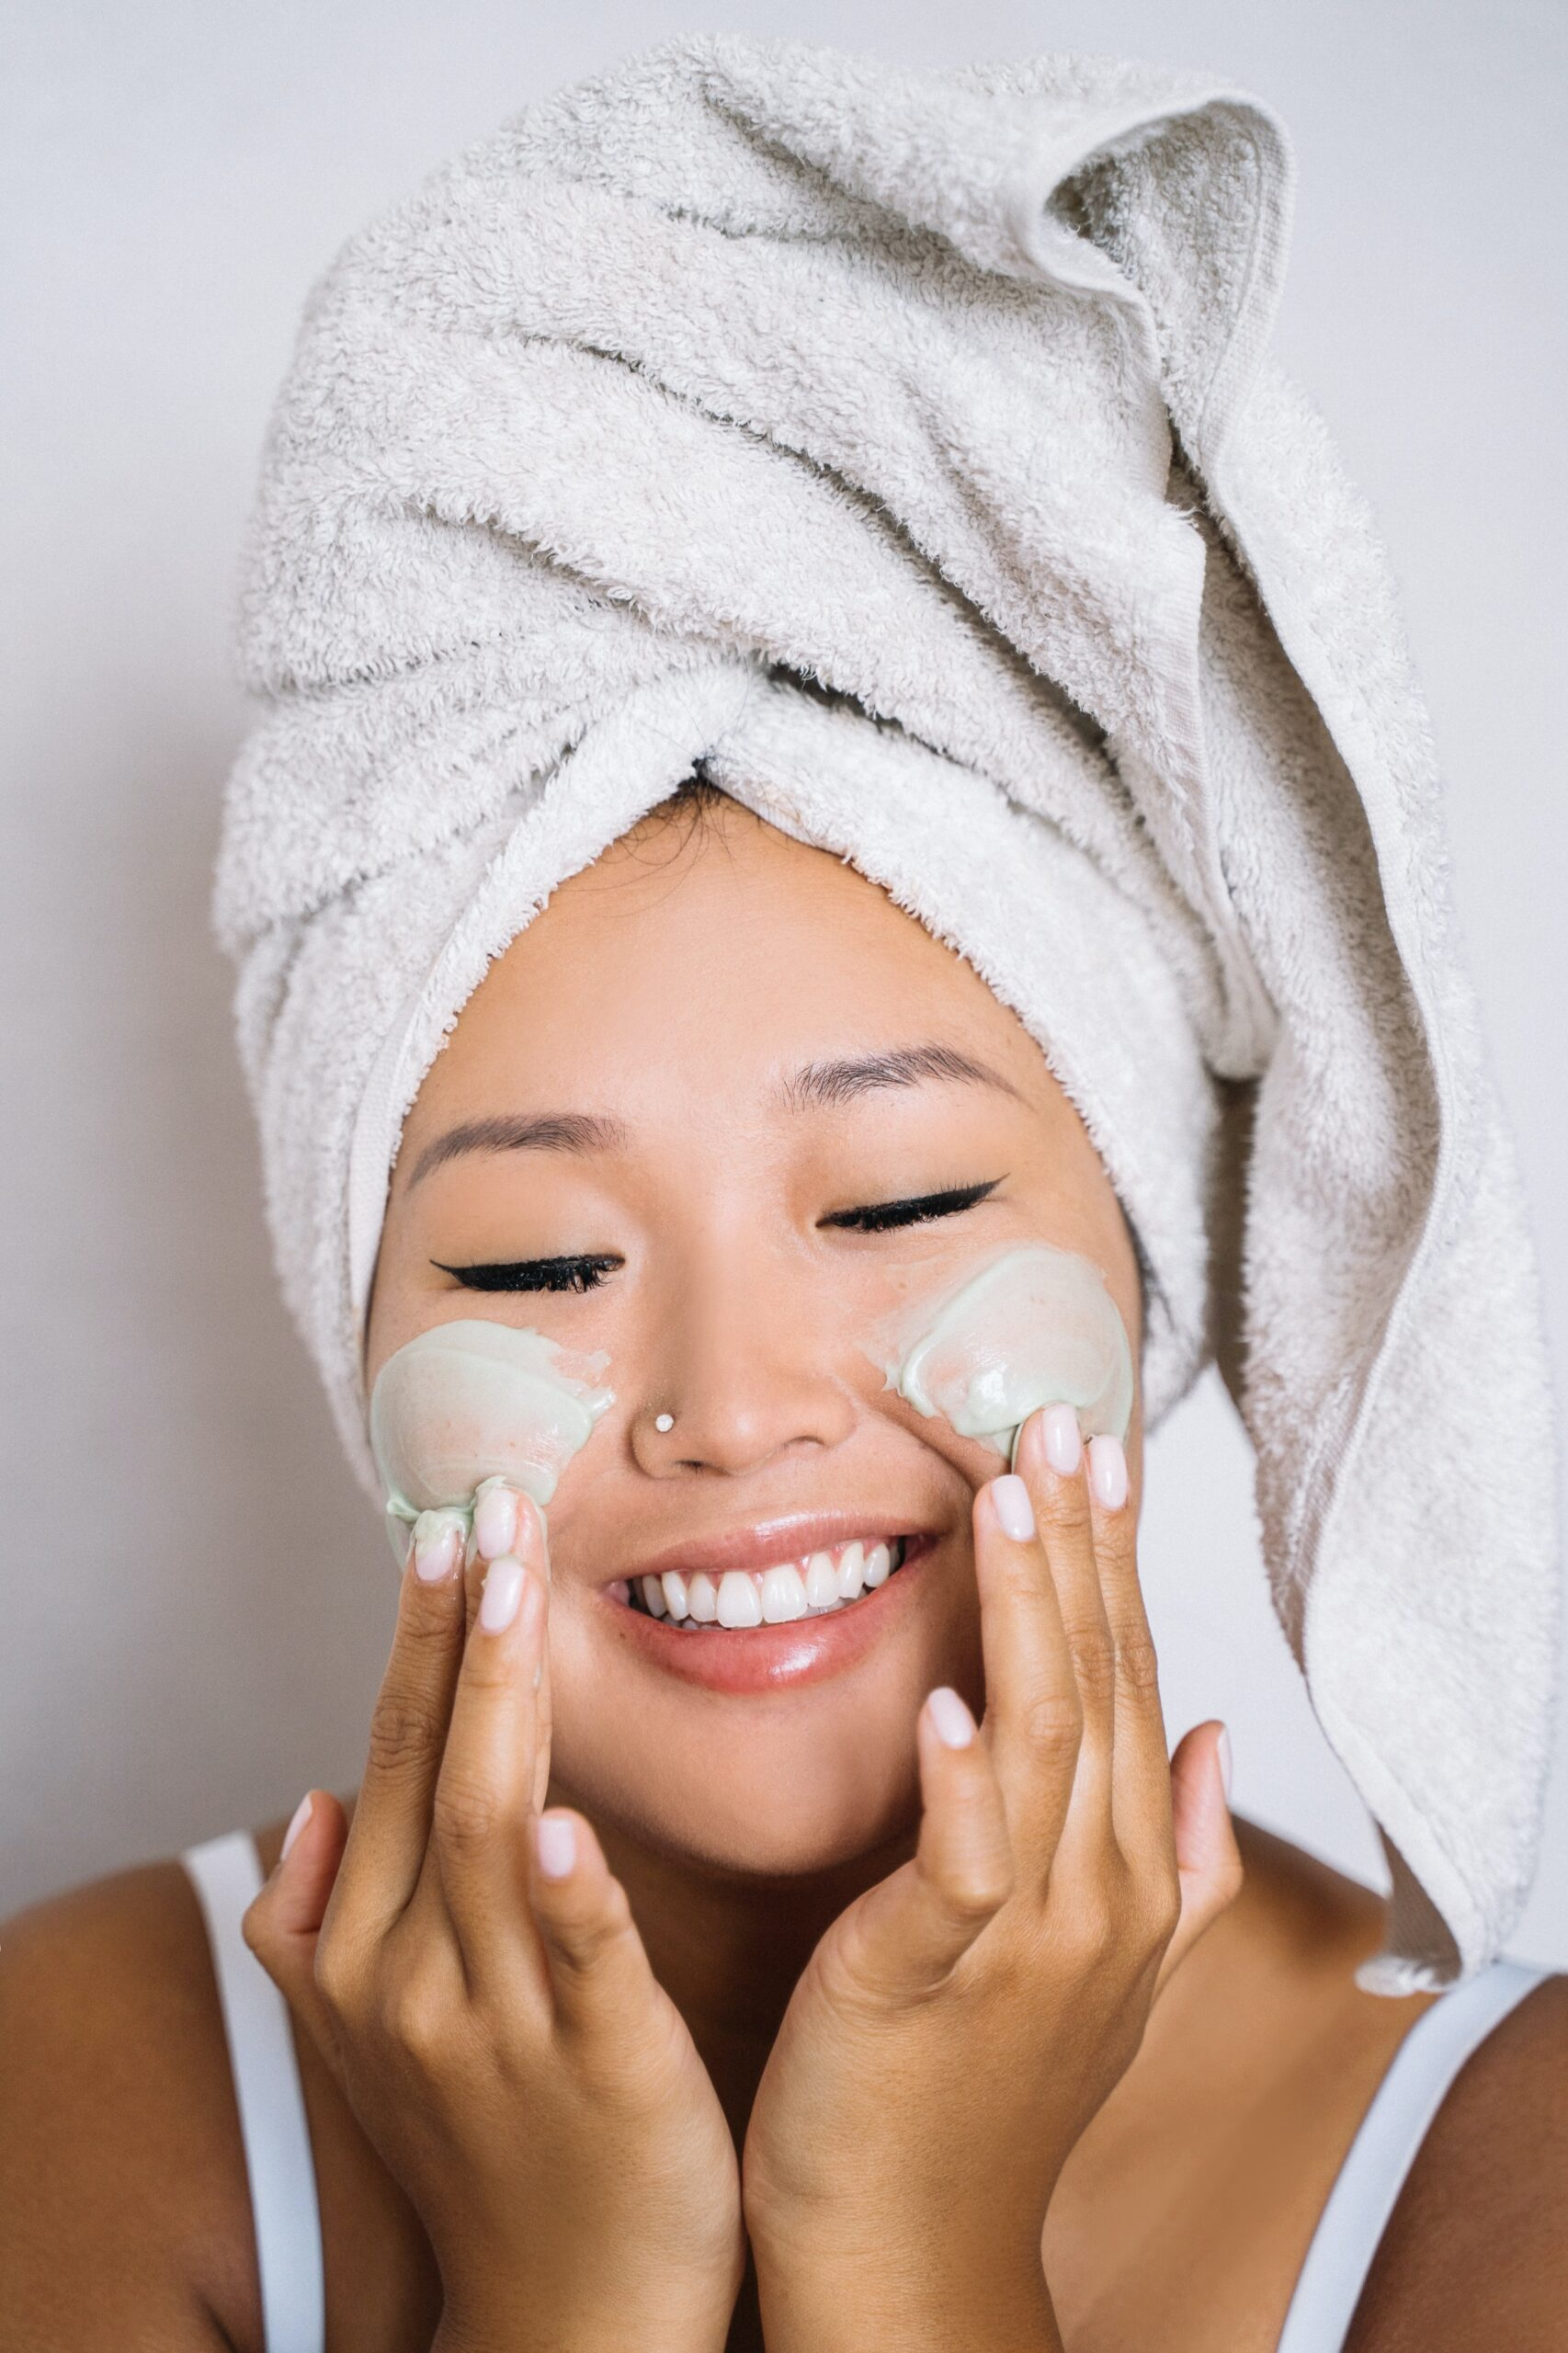 pexels anna tarazevich 5308631 scaled - Acne-prone skin Do's & Don'ts